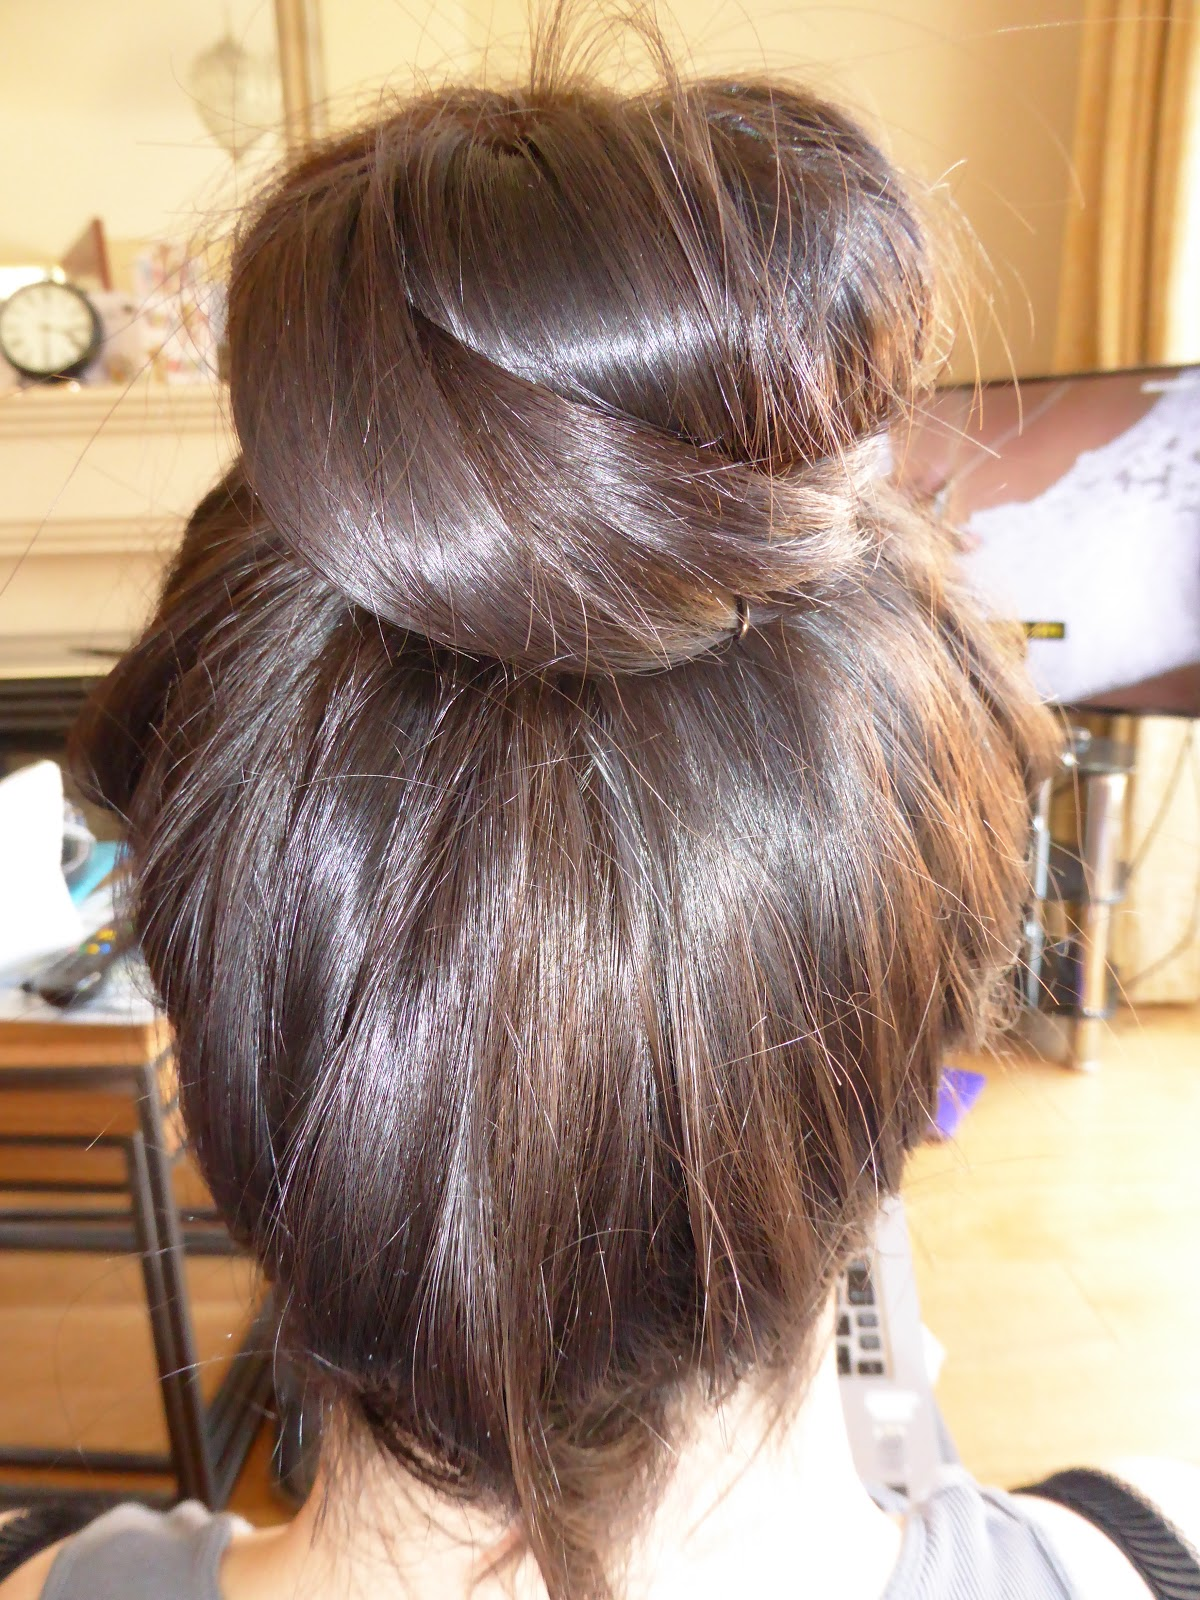 My Go To Summer Hair And Makeup Locketlizzie Xx